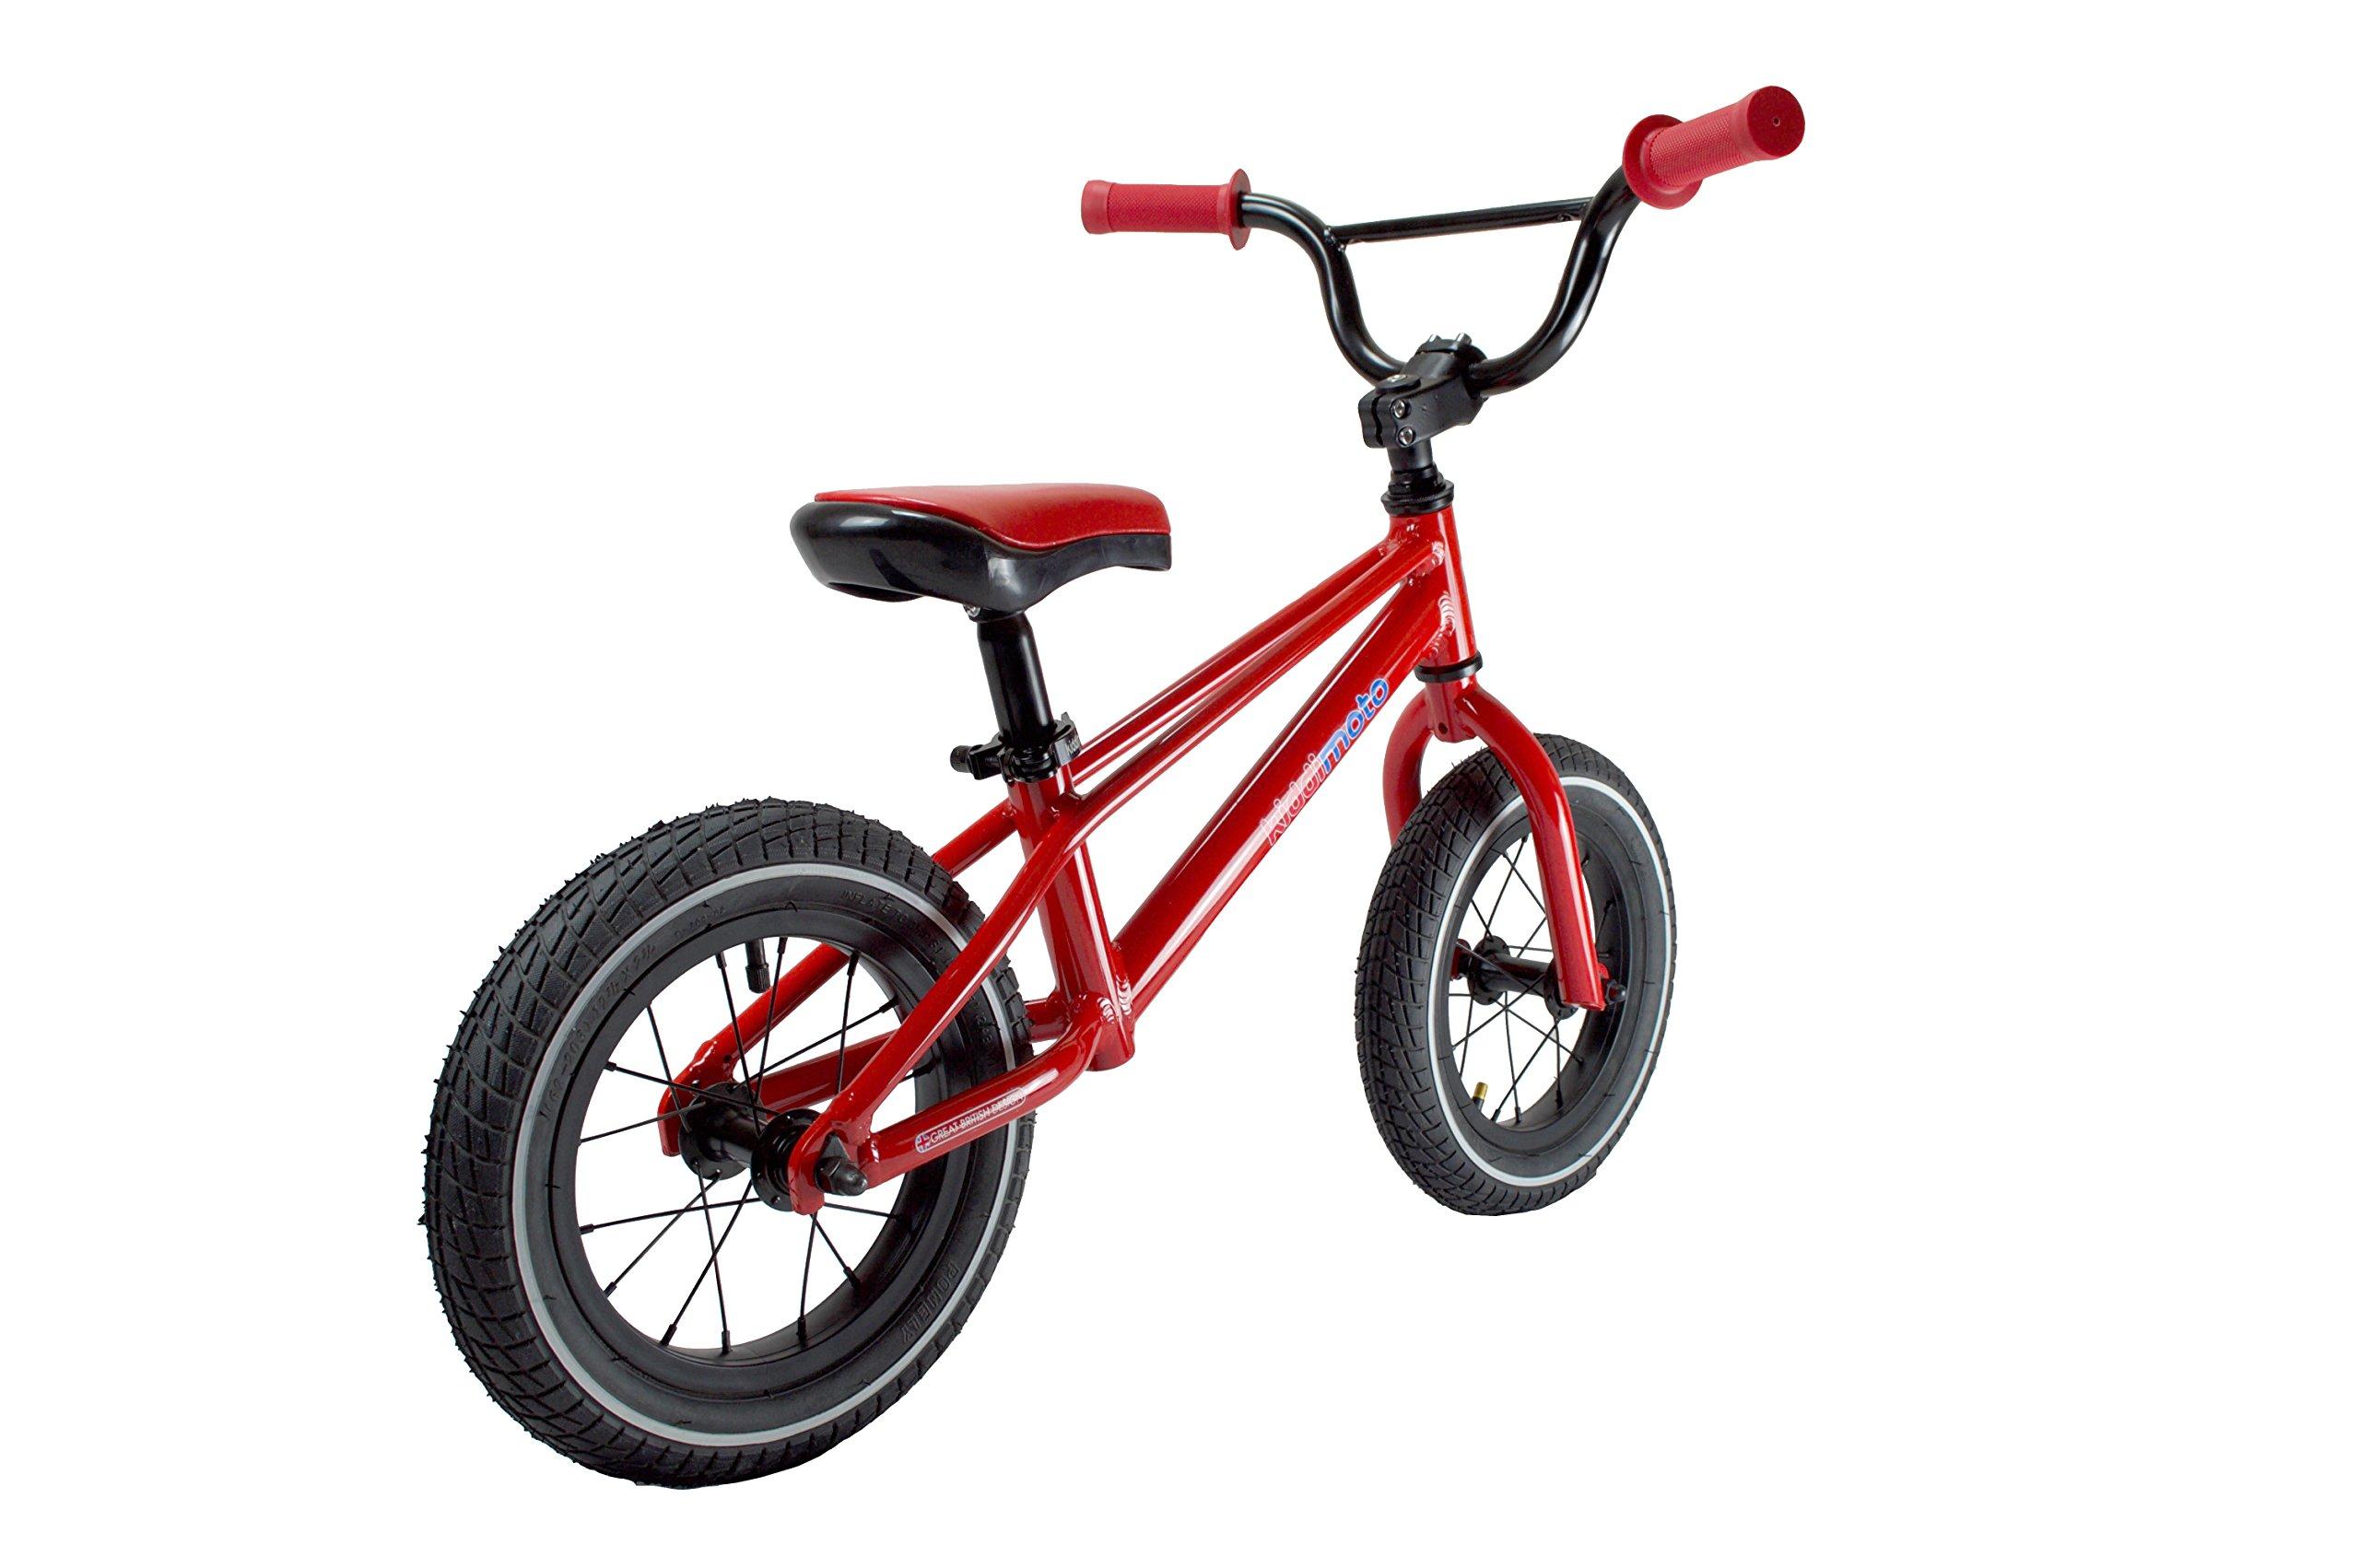 Kiddimoto BMX Running/Balance Bike, Red by Kiddimoto (Image #3)